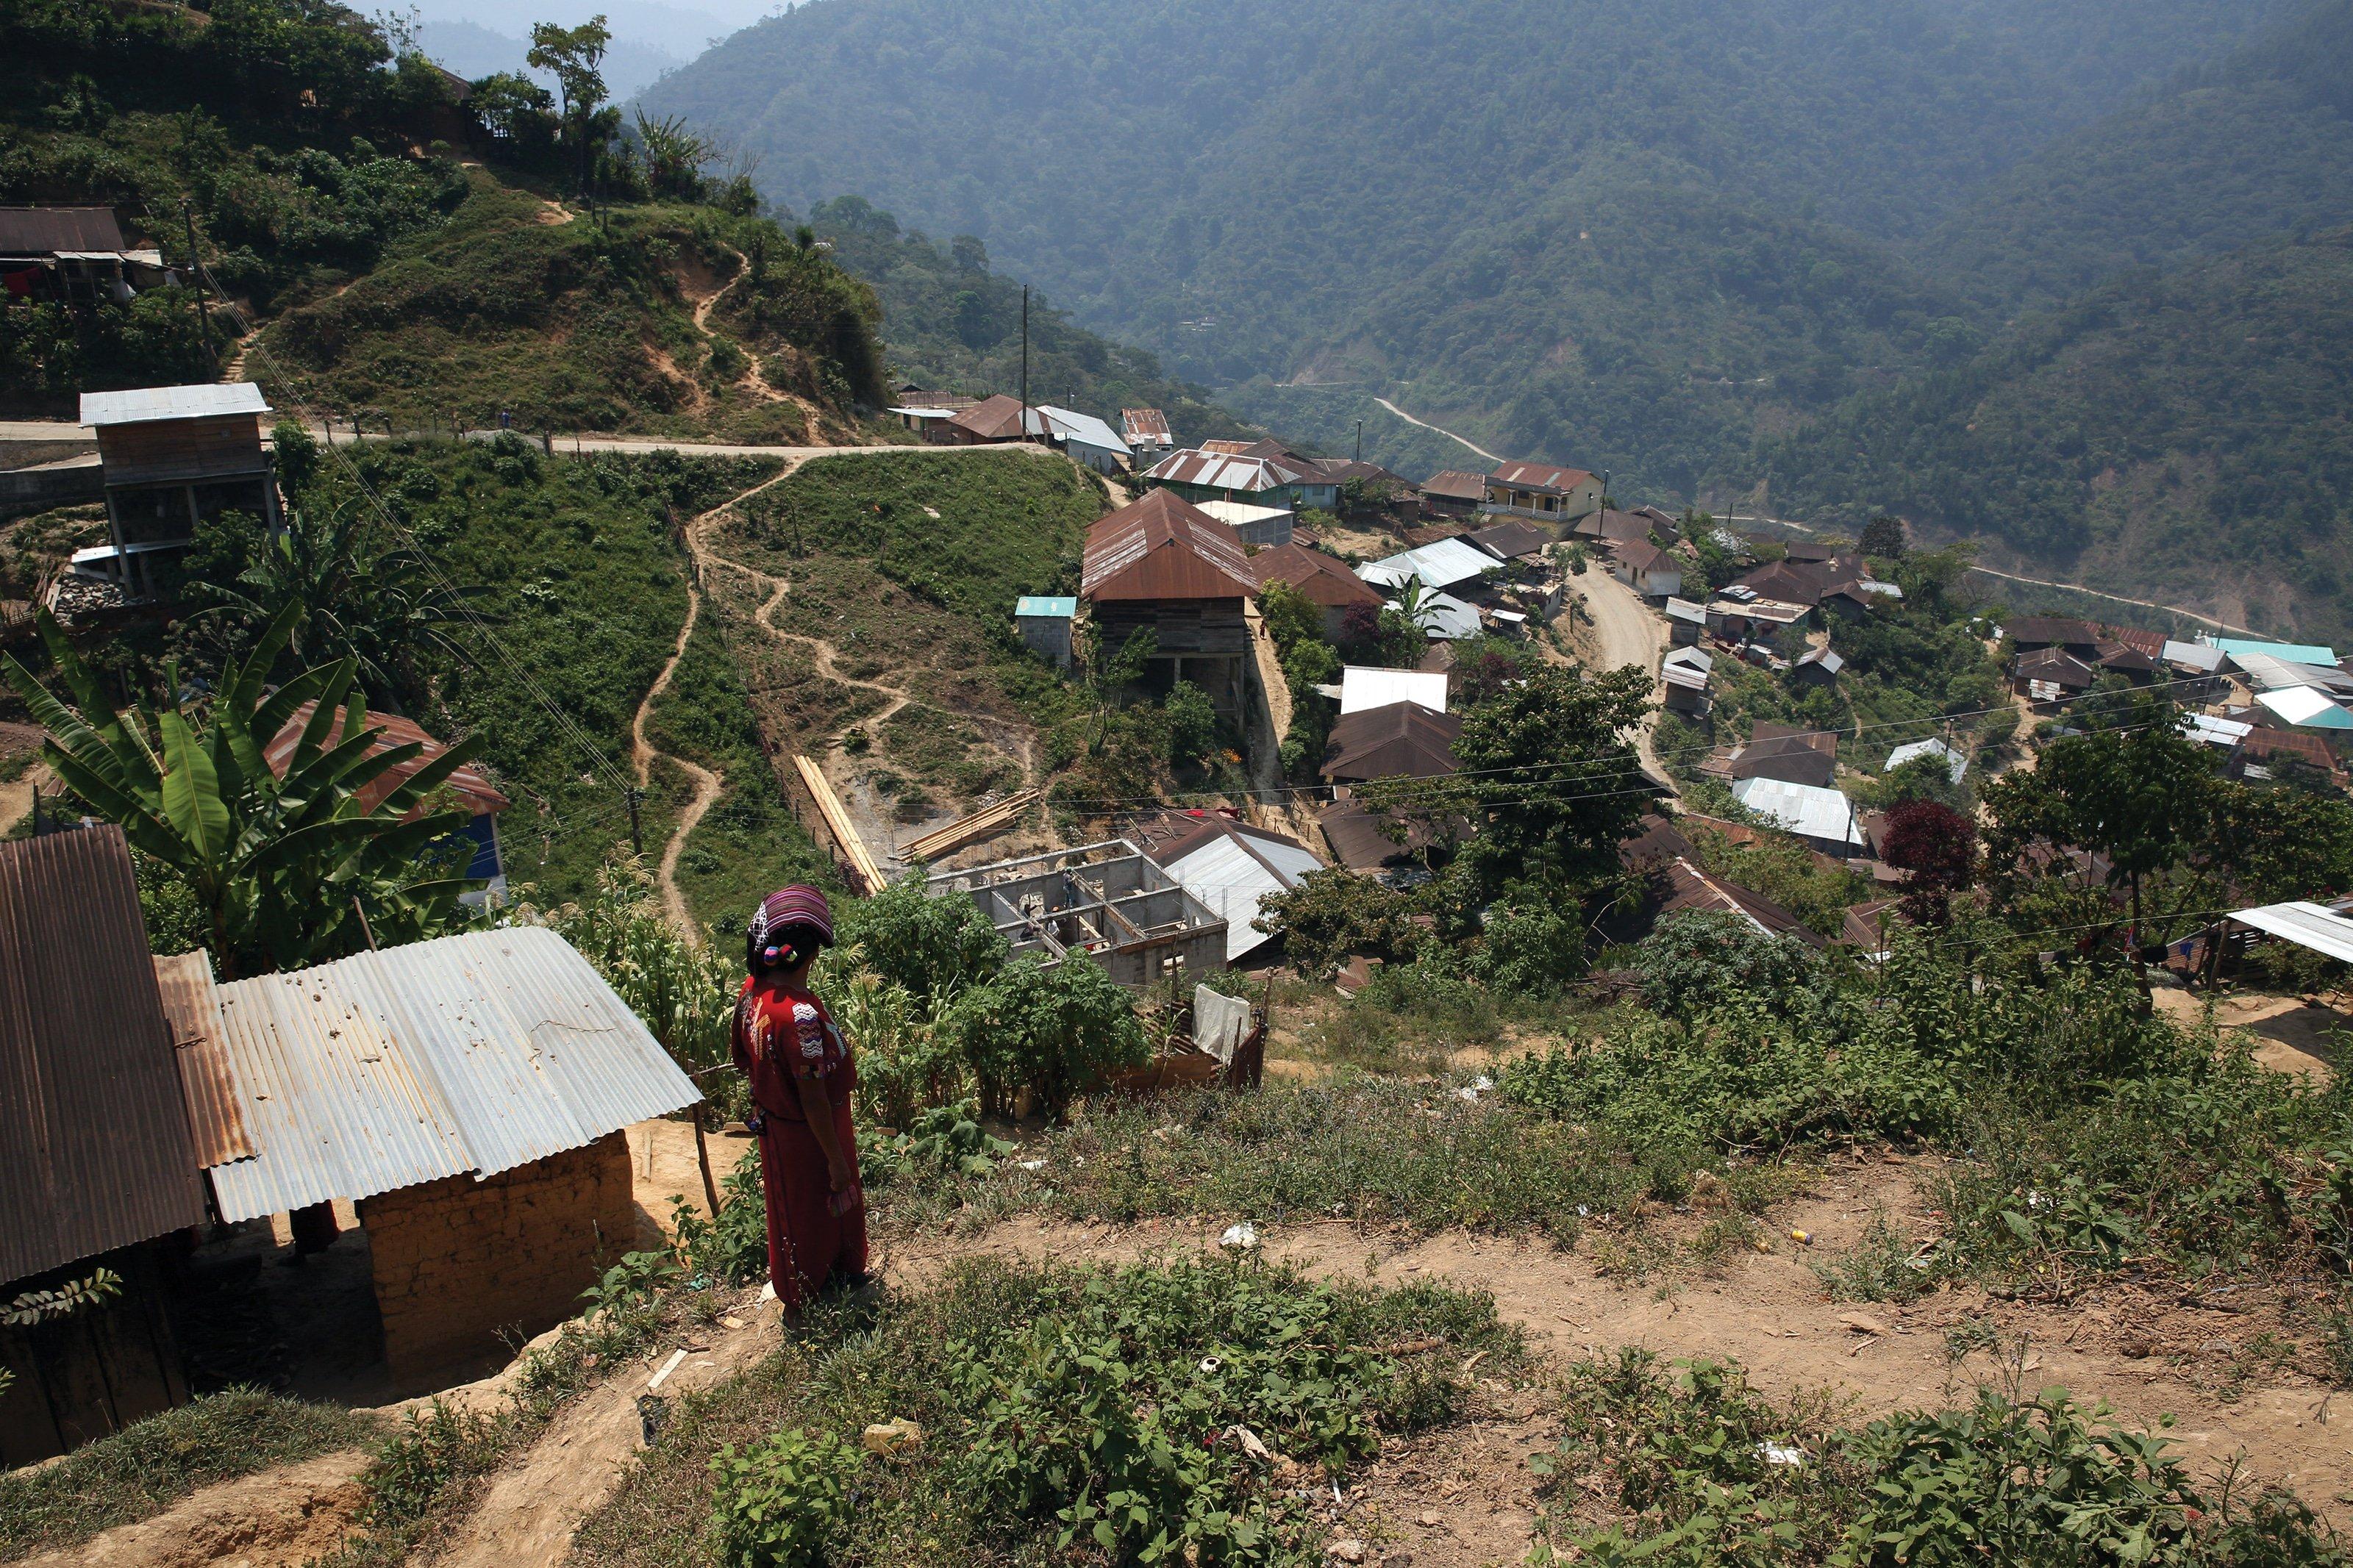 dorie hagler Chel1353 - Photo Essay: Making Photos in Guatemala